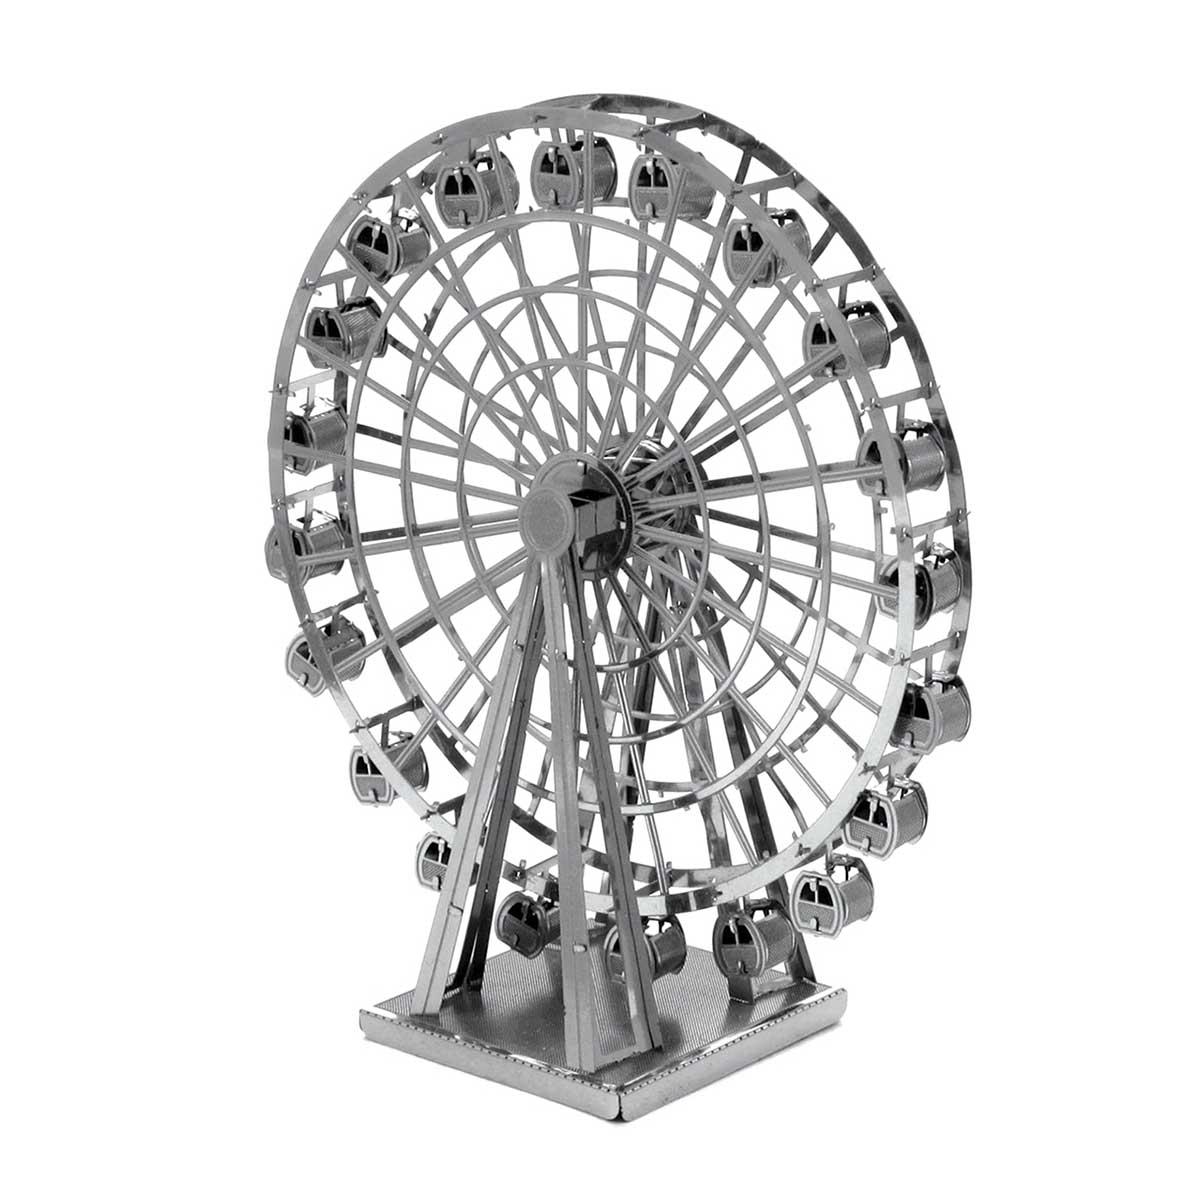 Ferris Wheel Carnival Metal Puzzles